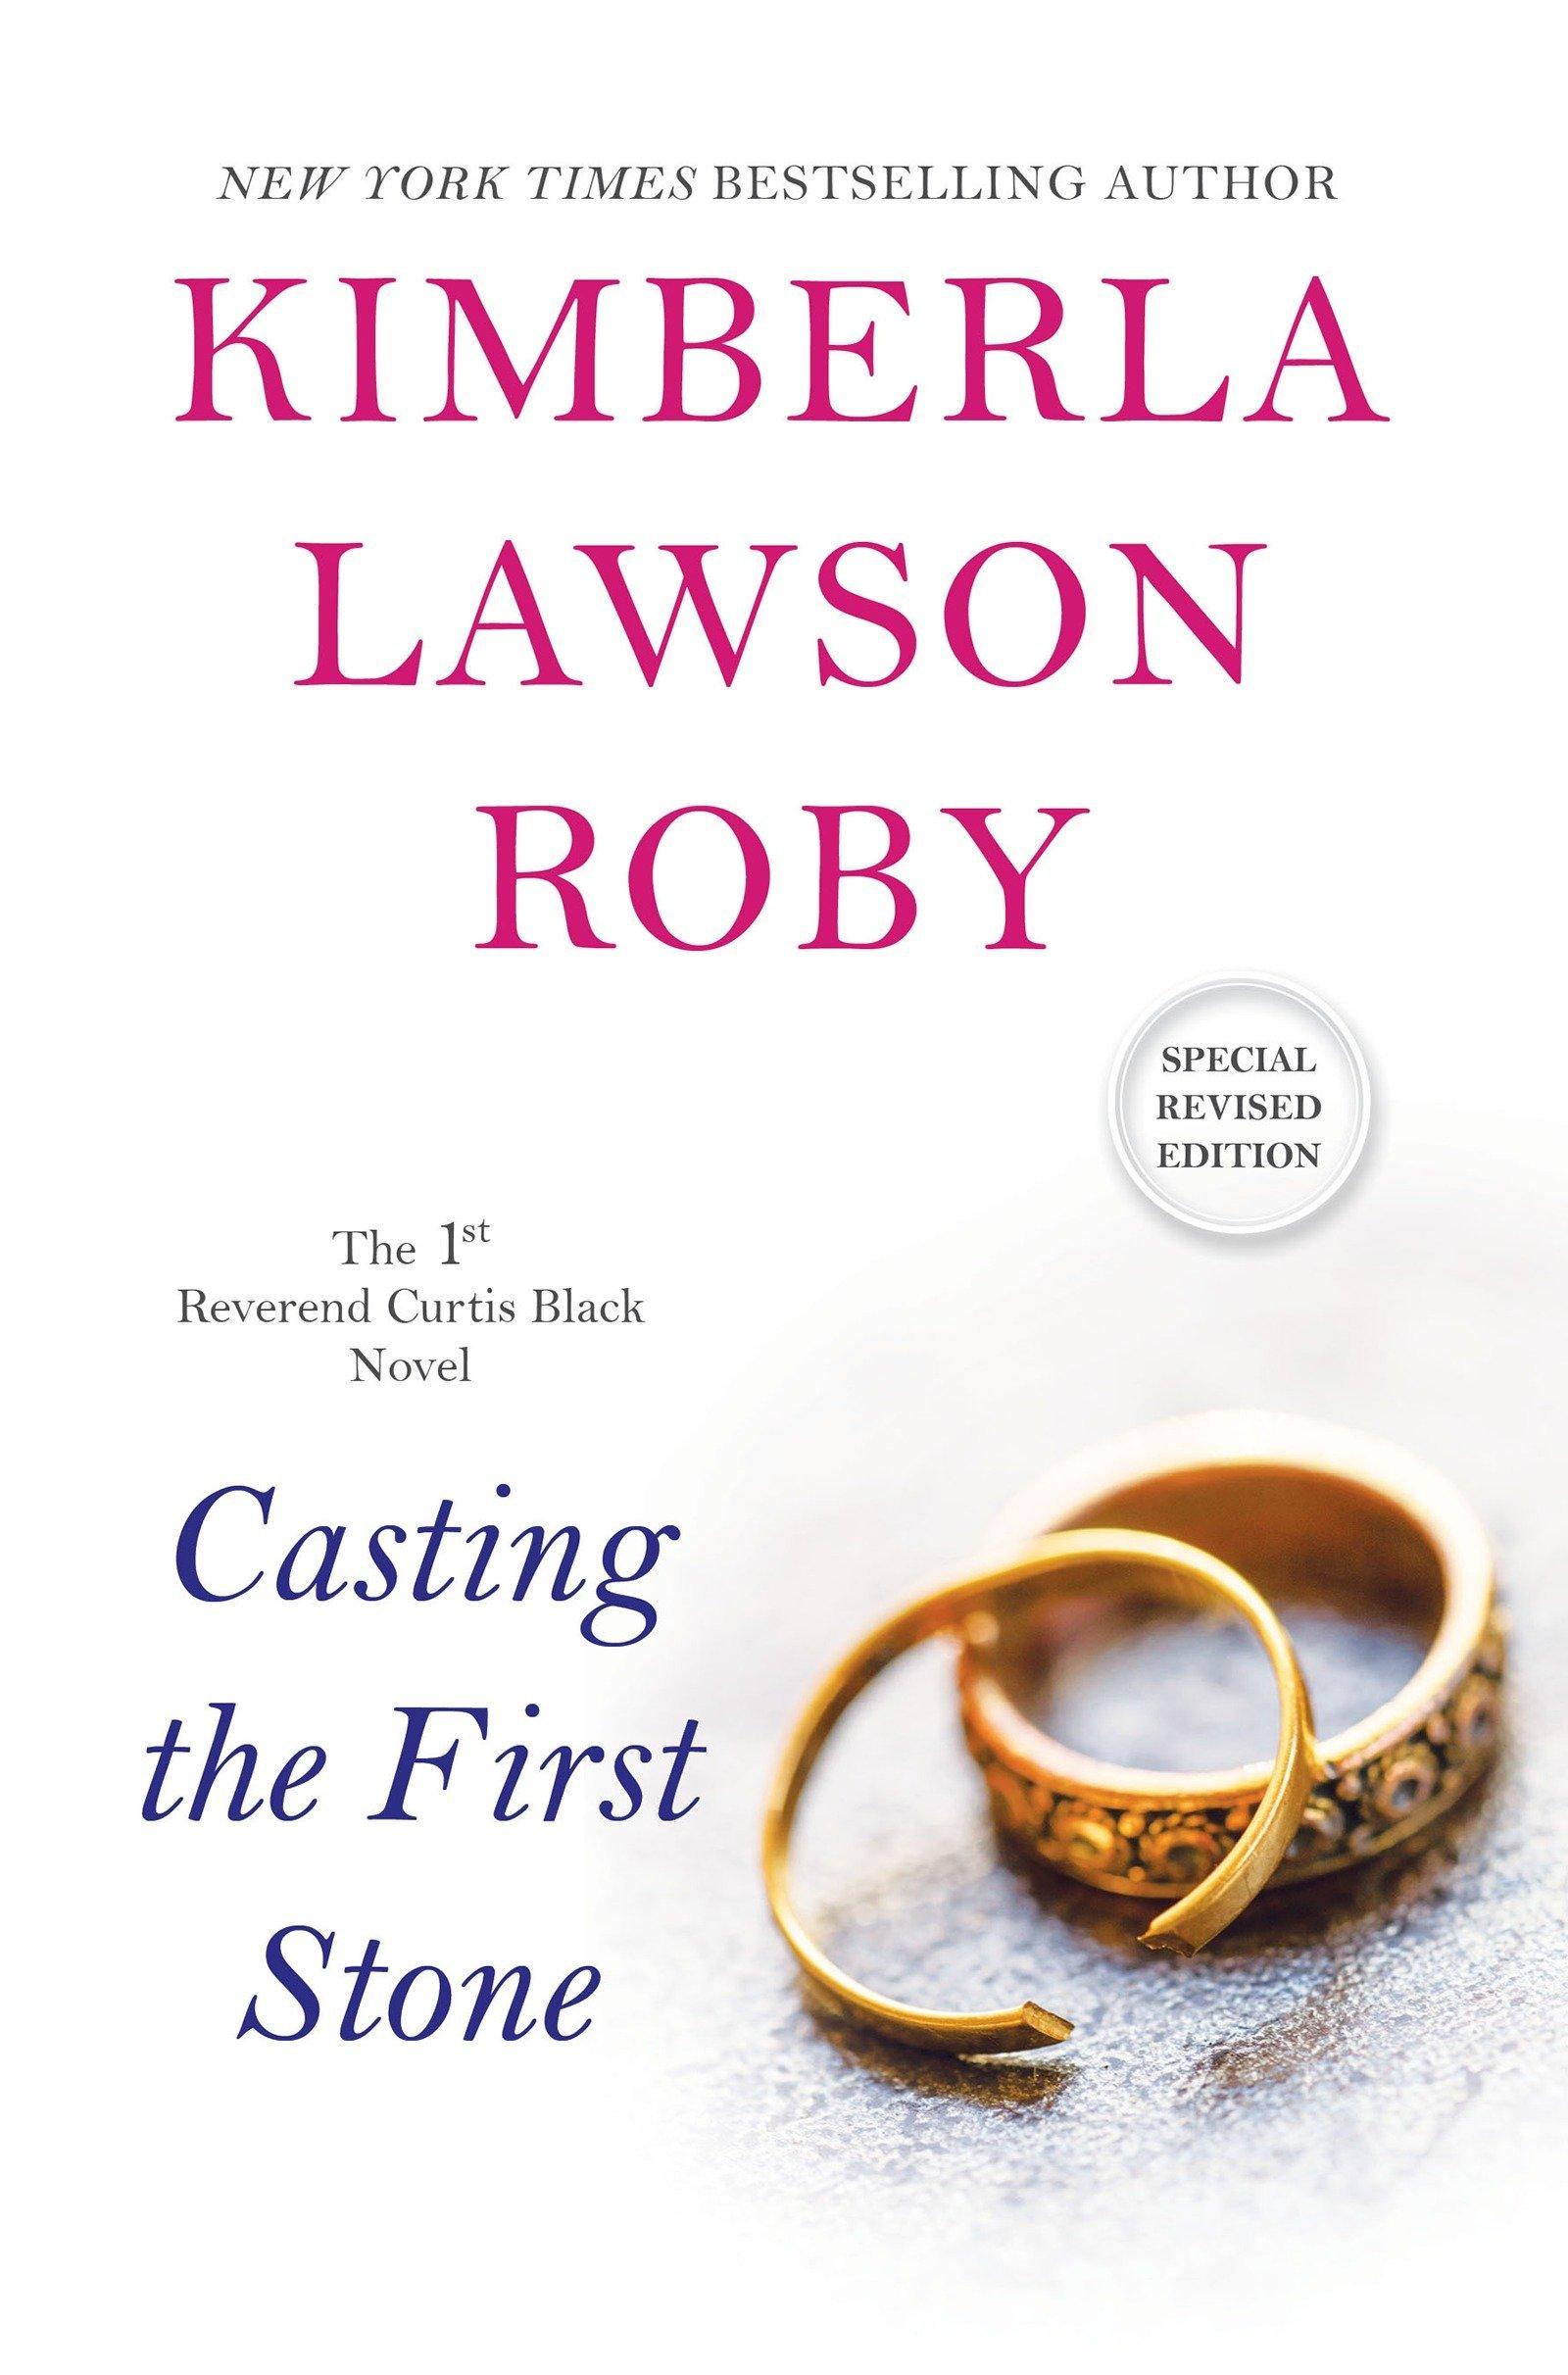 Amazon.com: Casting the First Stone (9781496716392): Kimberla Lawson Roby:  Books